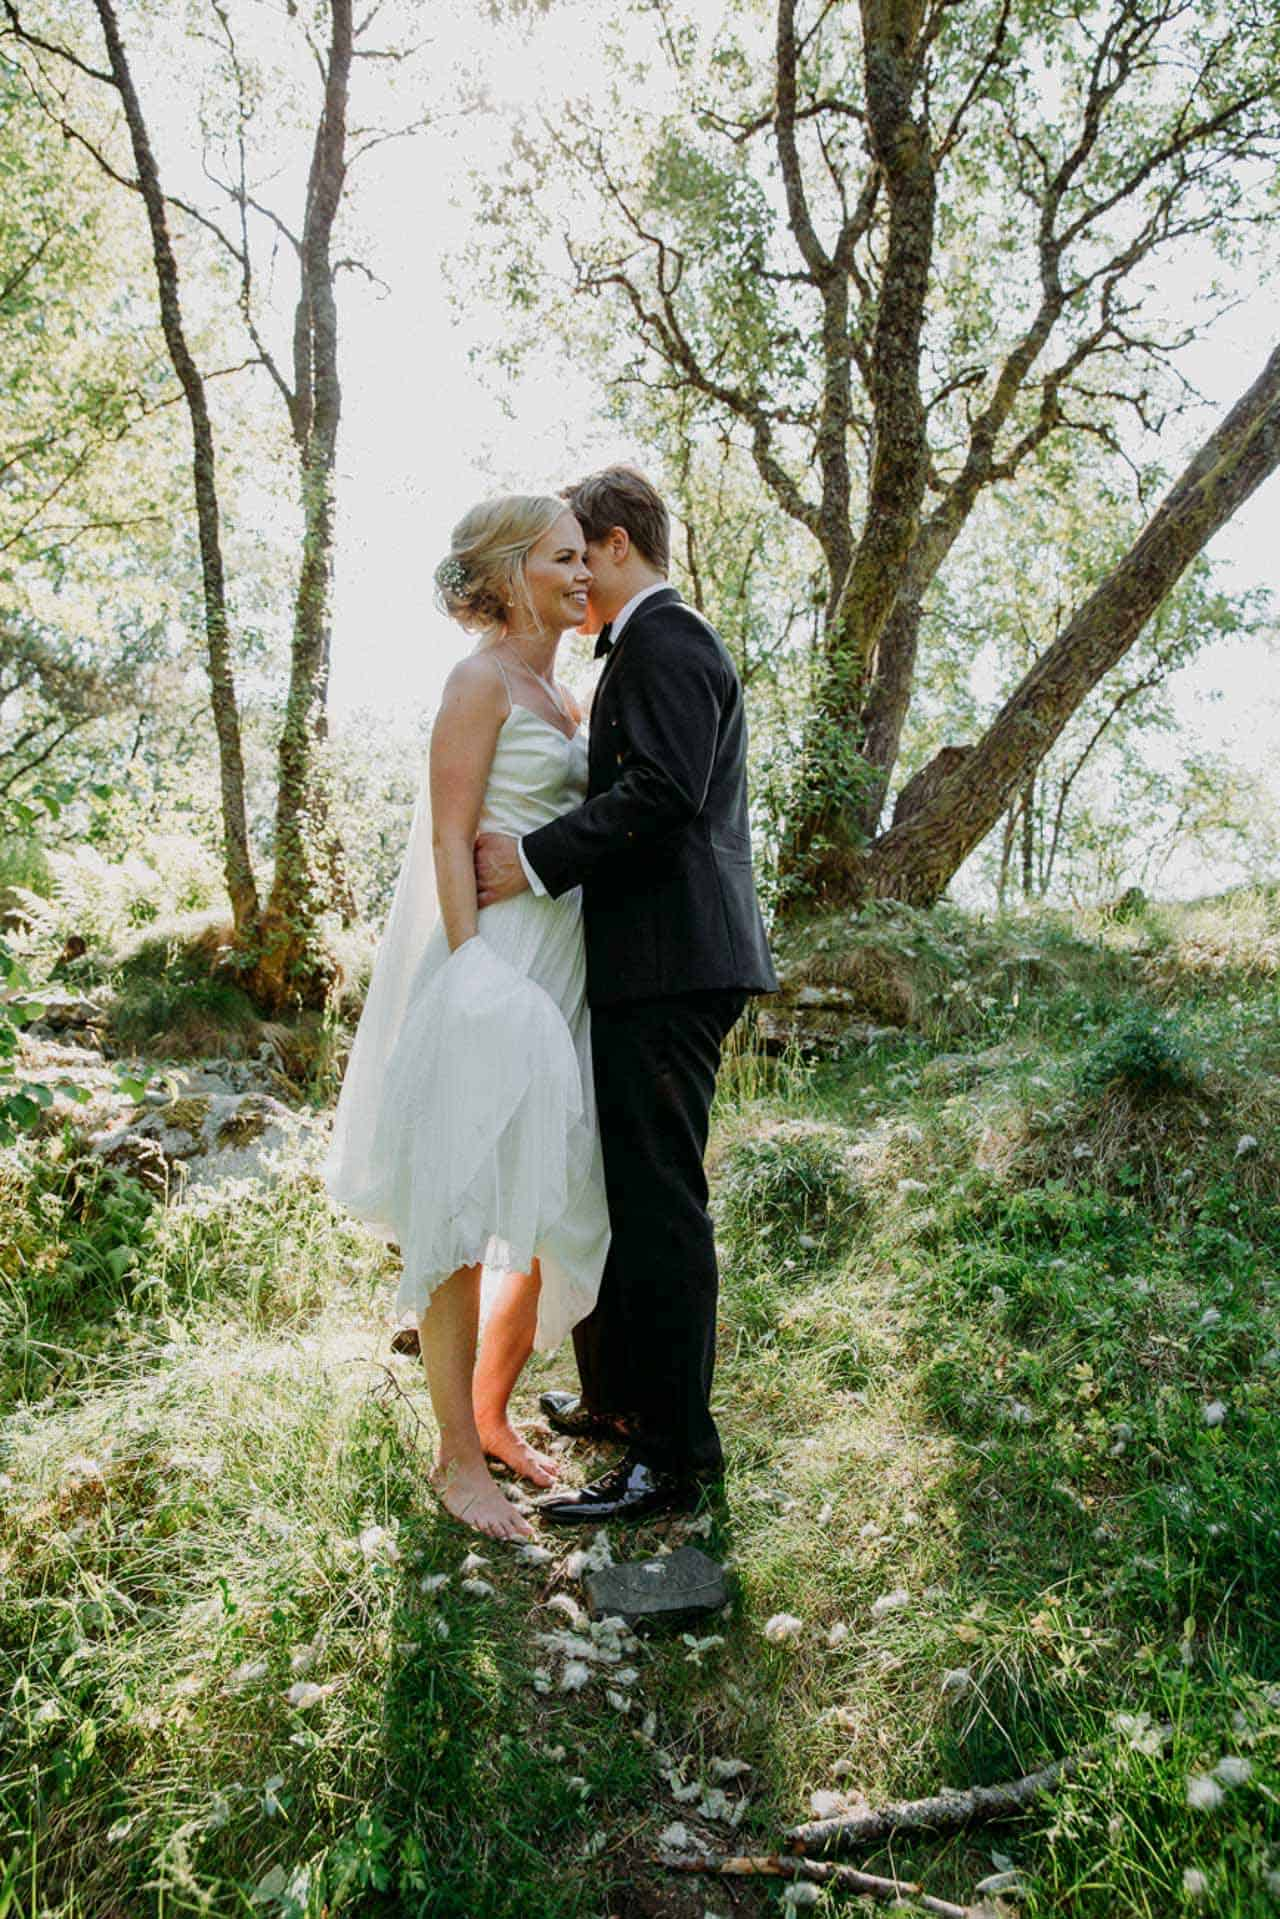 fotograf til bryllup Aalborg